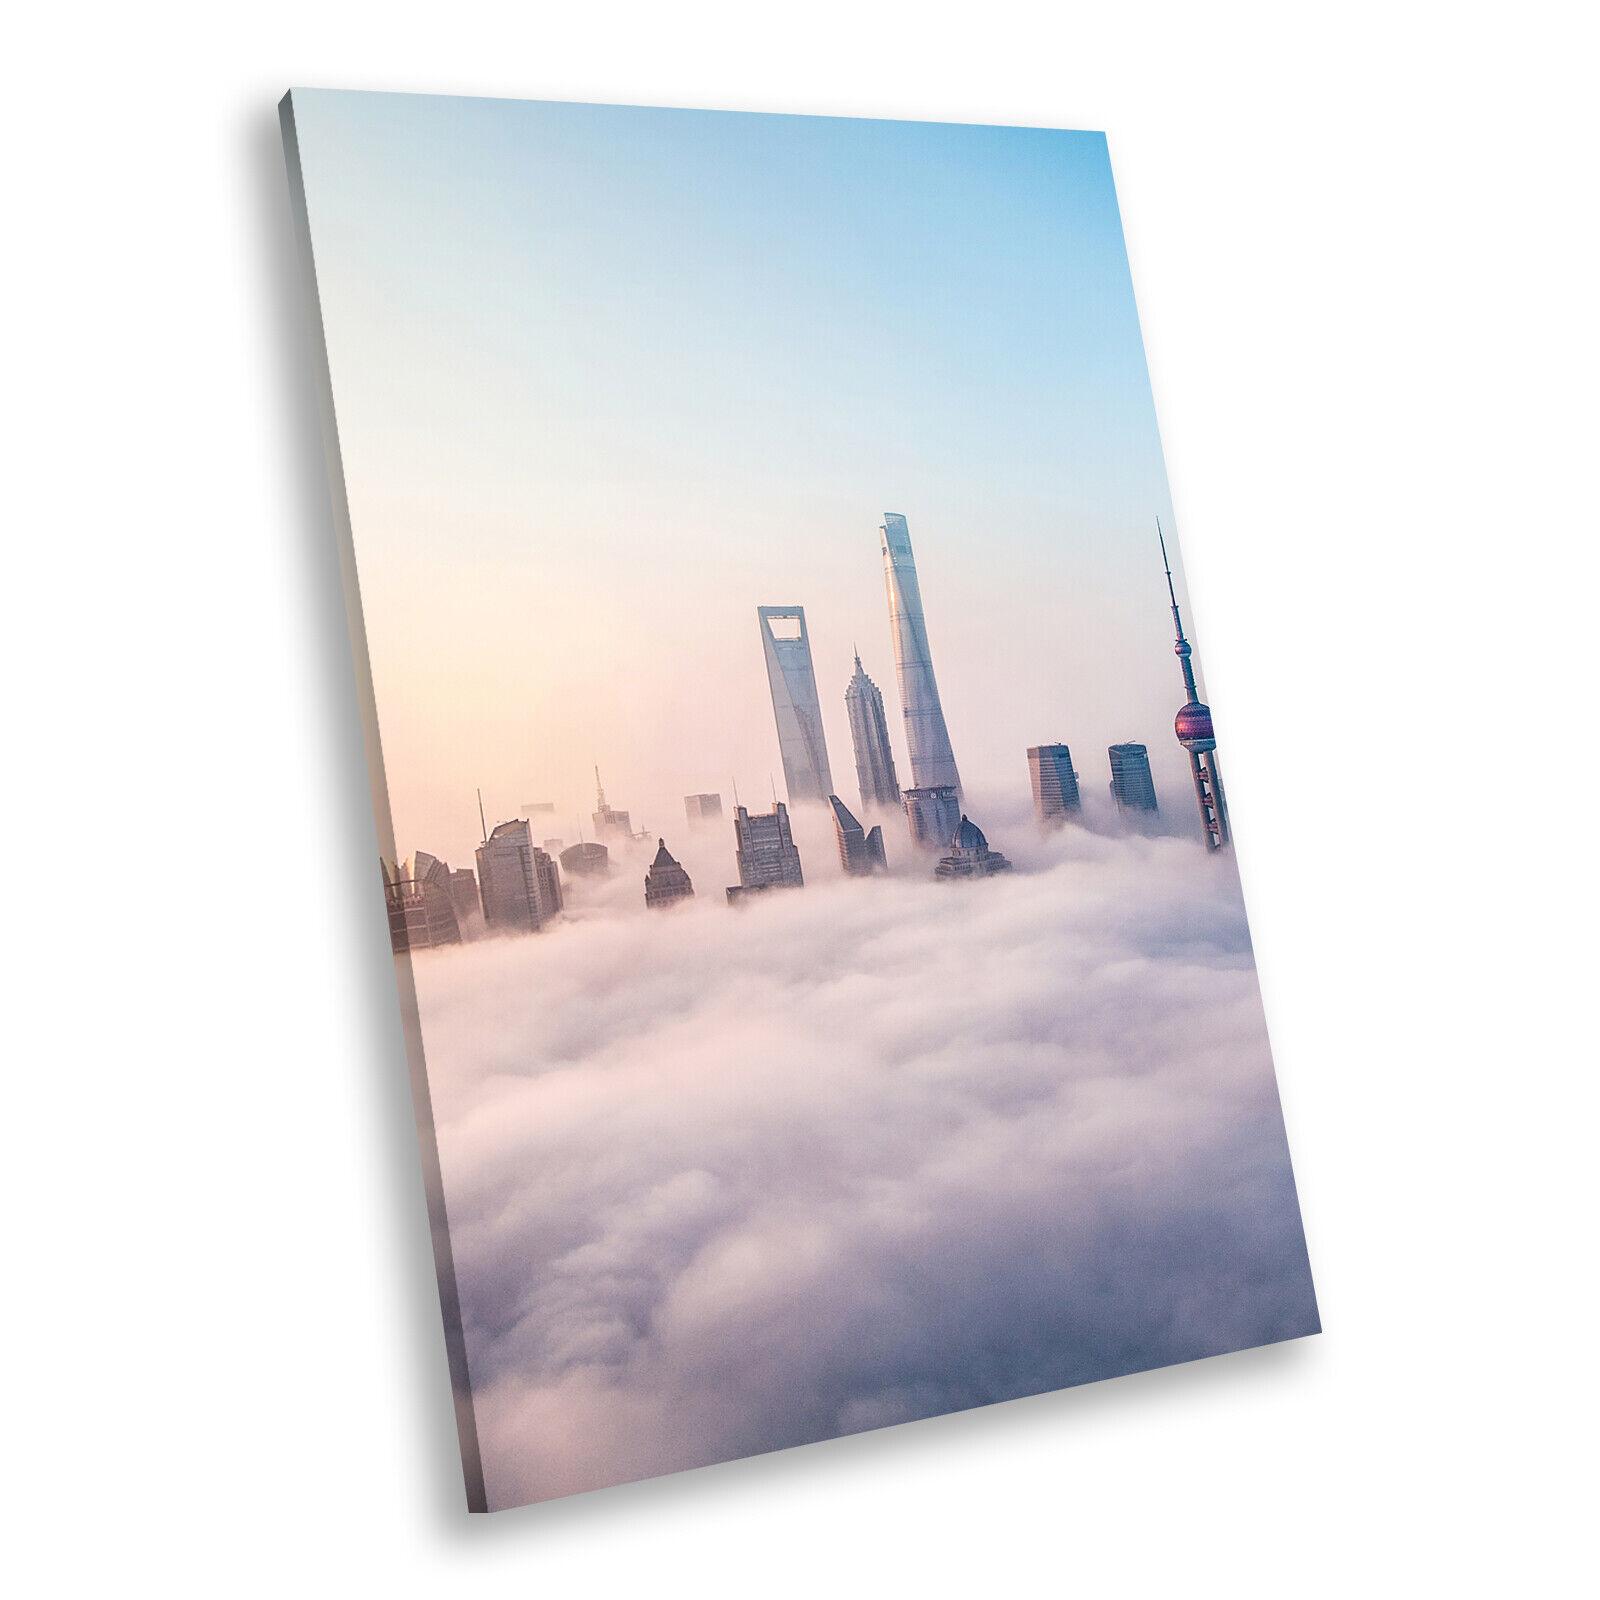 Blau Weiß City Skyline Clouds Portrait Scenic Canvas Wall Art Picture Prints